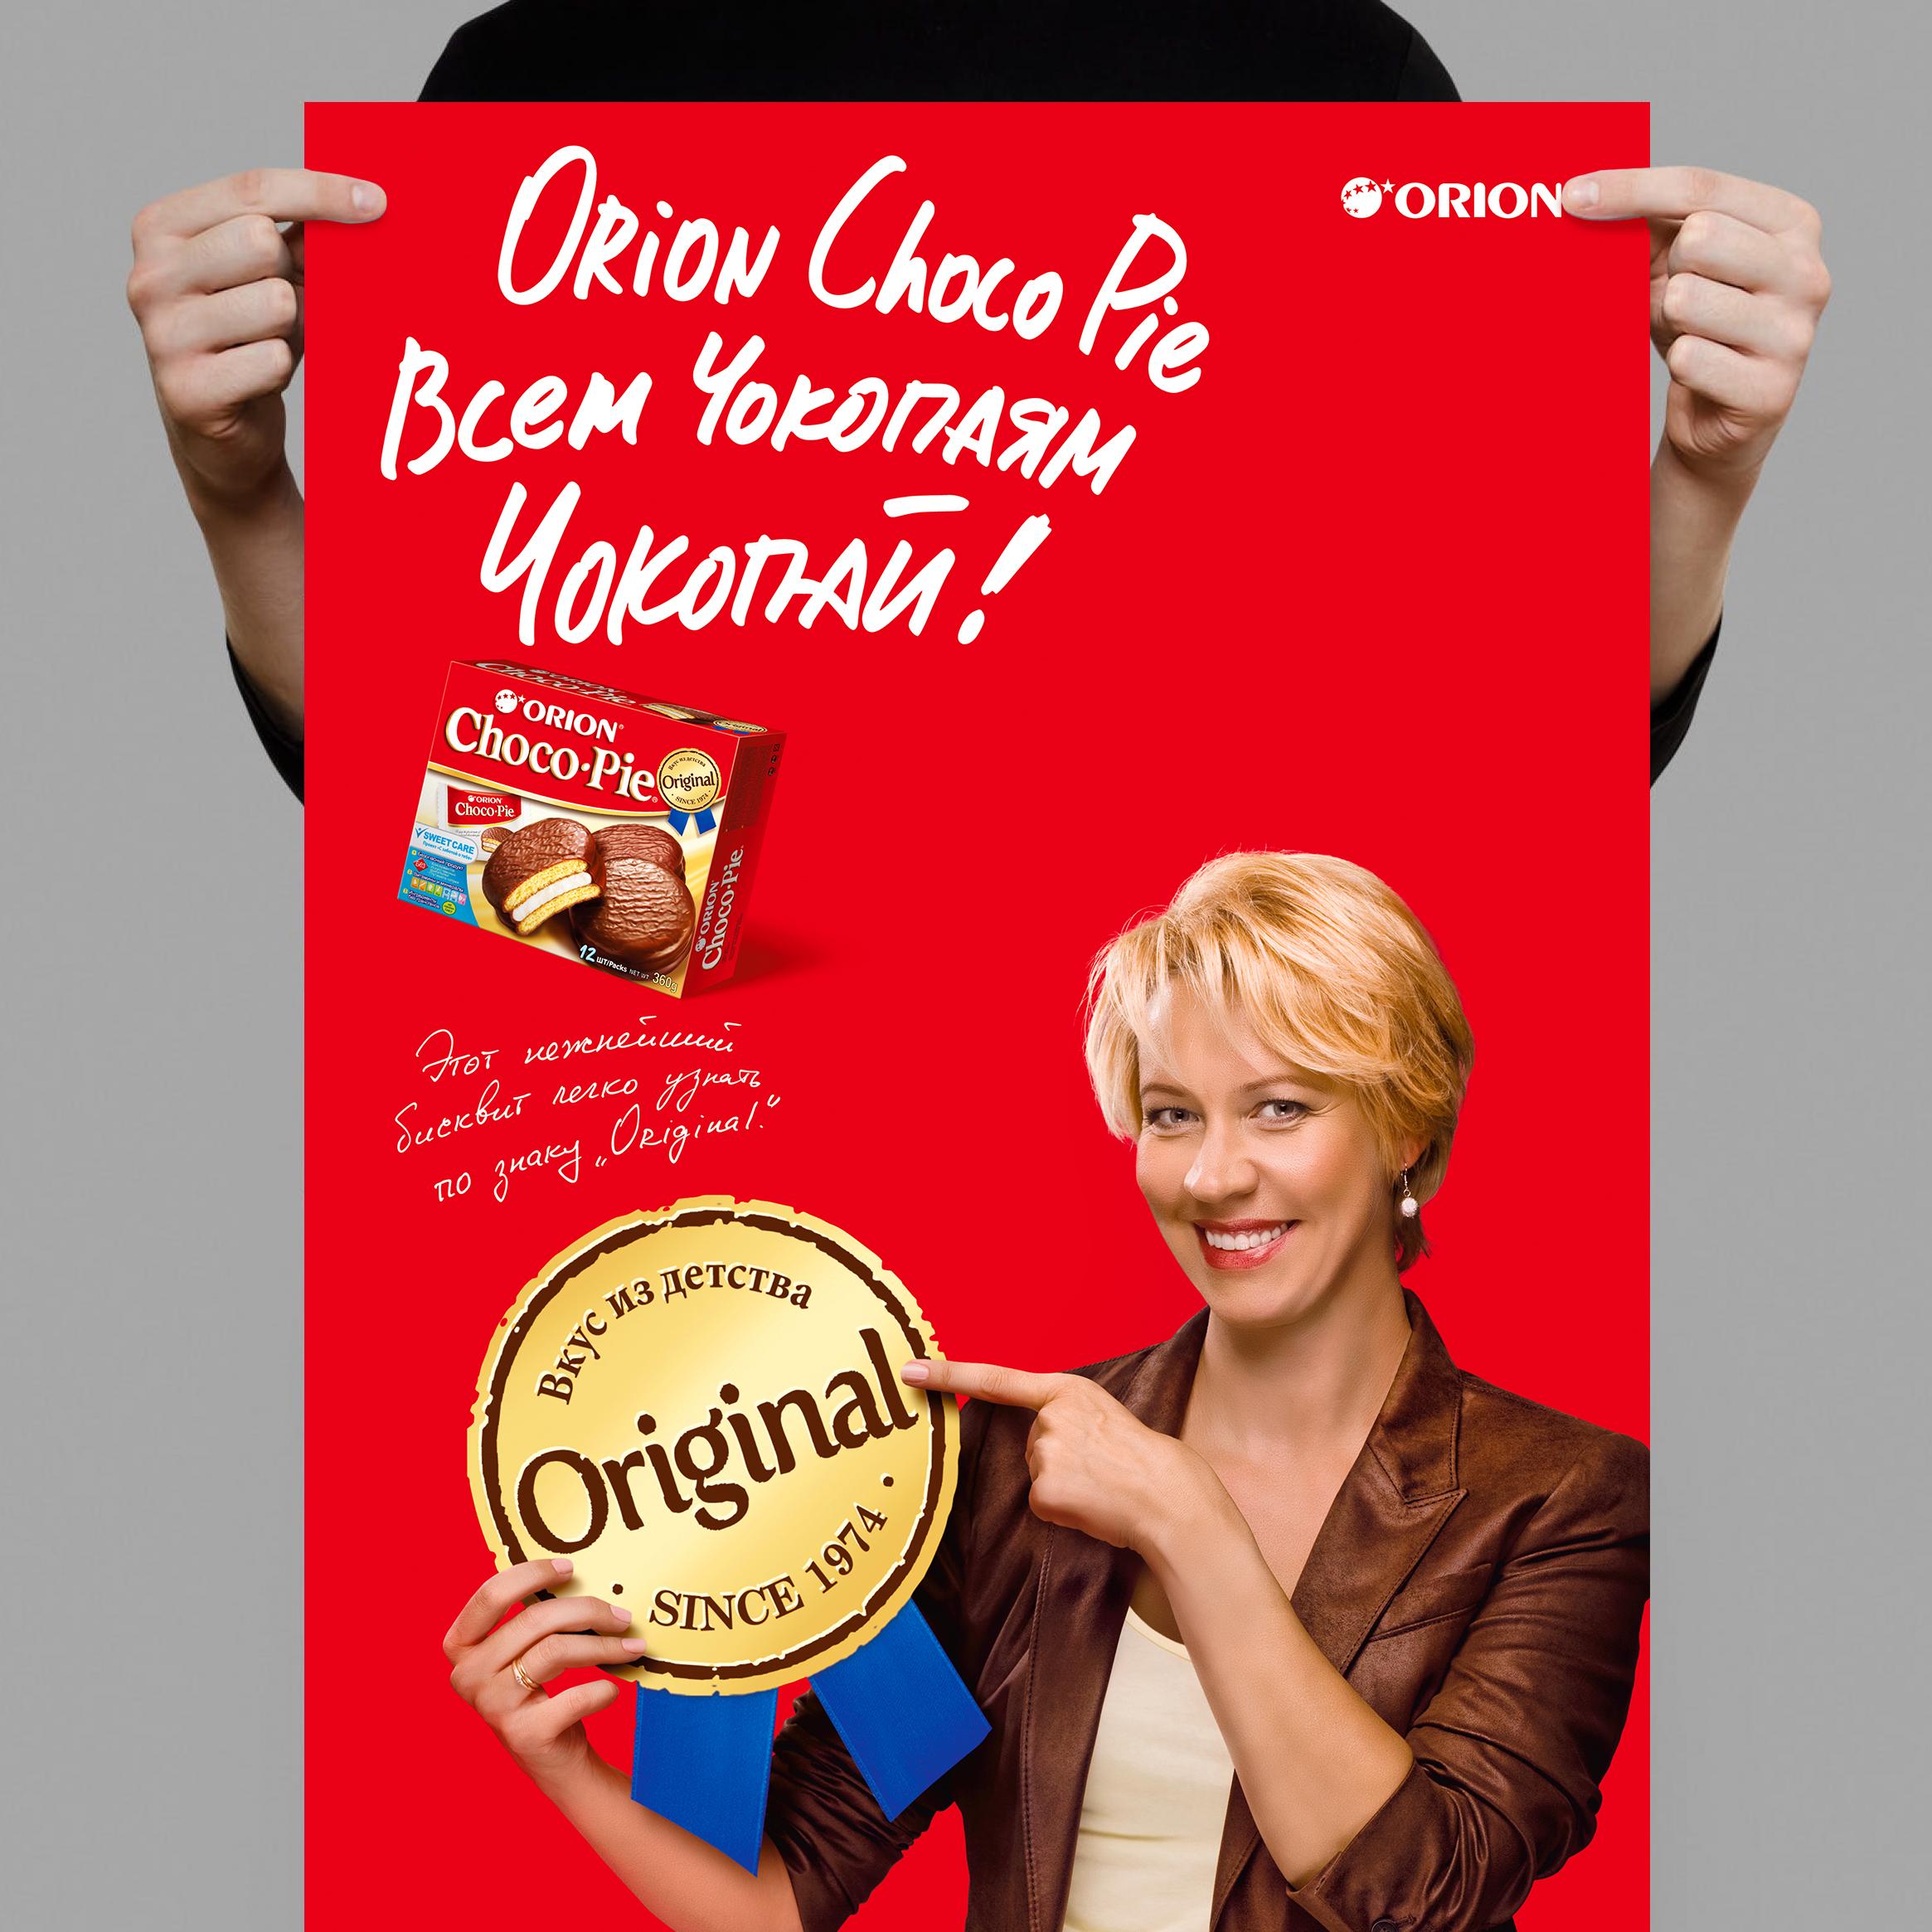 Orion_Choco_Pie_Poster_design_1